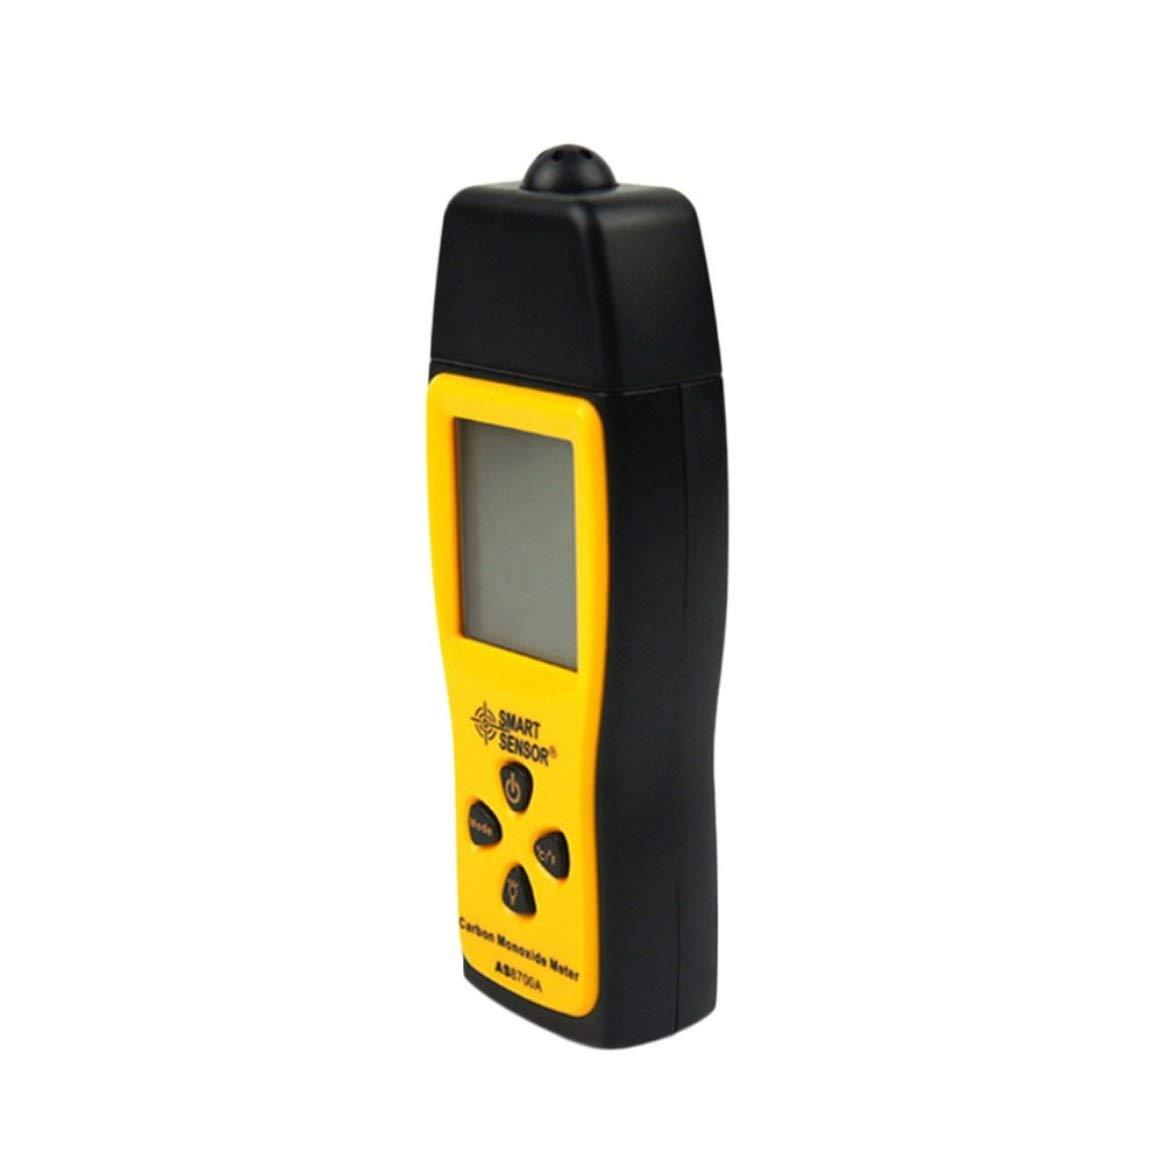 Kongqiabona Elektronische messger/ät LCD Display Kohlenmonoxid Meter mit Hintergrundbeleuchtung Handheld CO Gas Tester Monitor Detektor Analyzer 0 ~ 1000 PPM CO Messger/ät